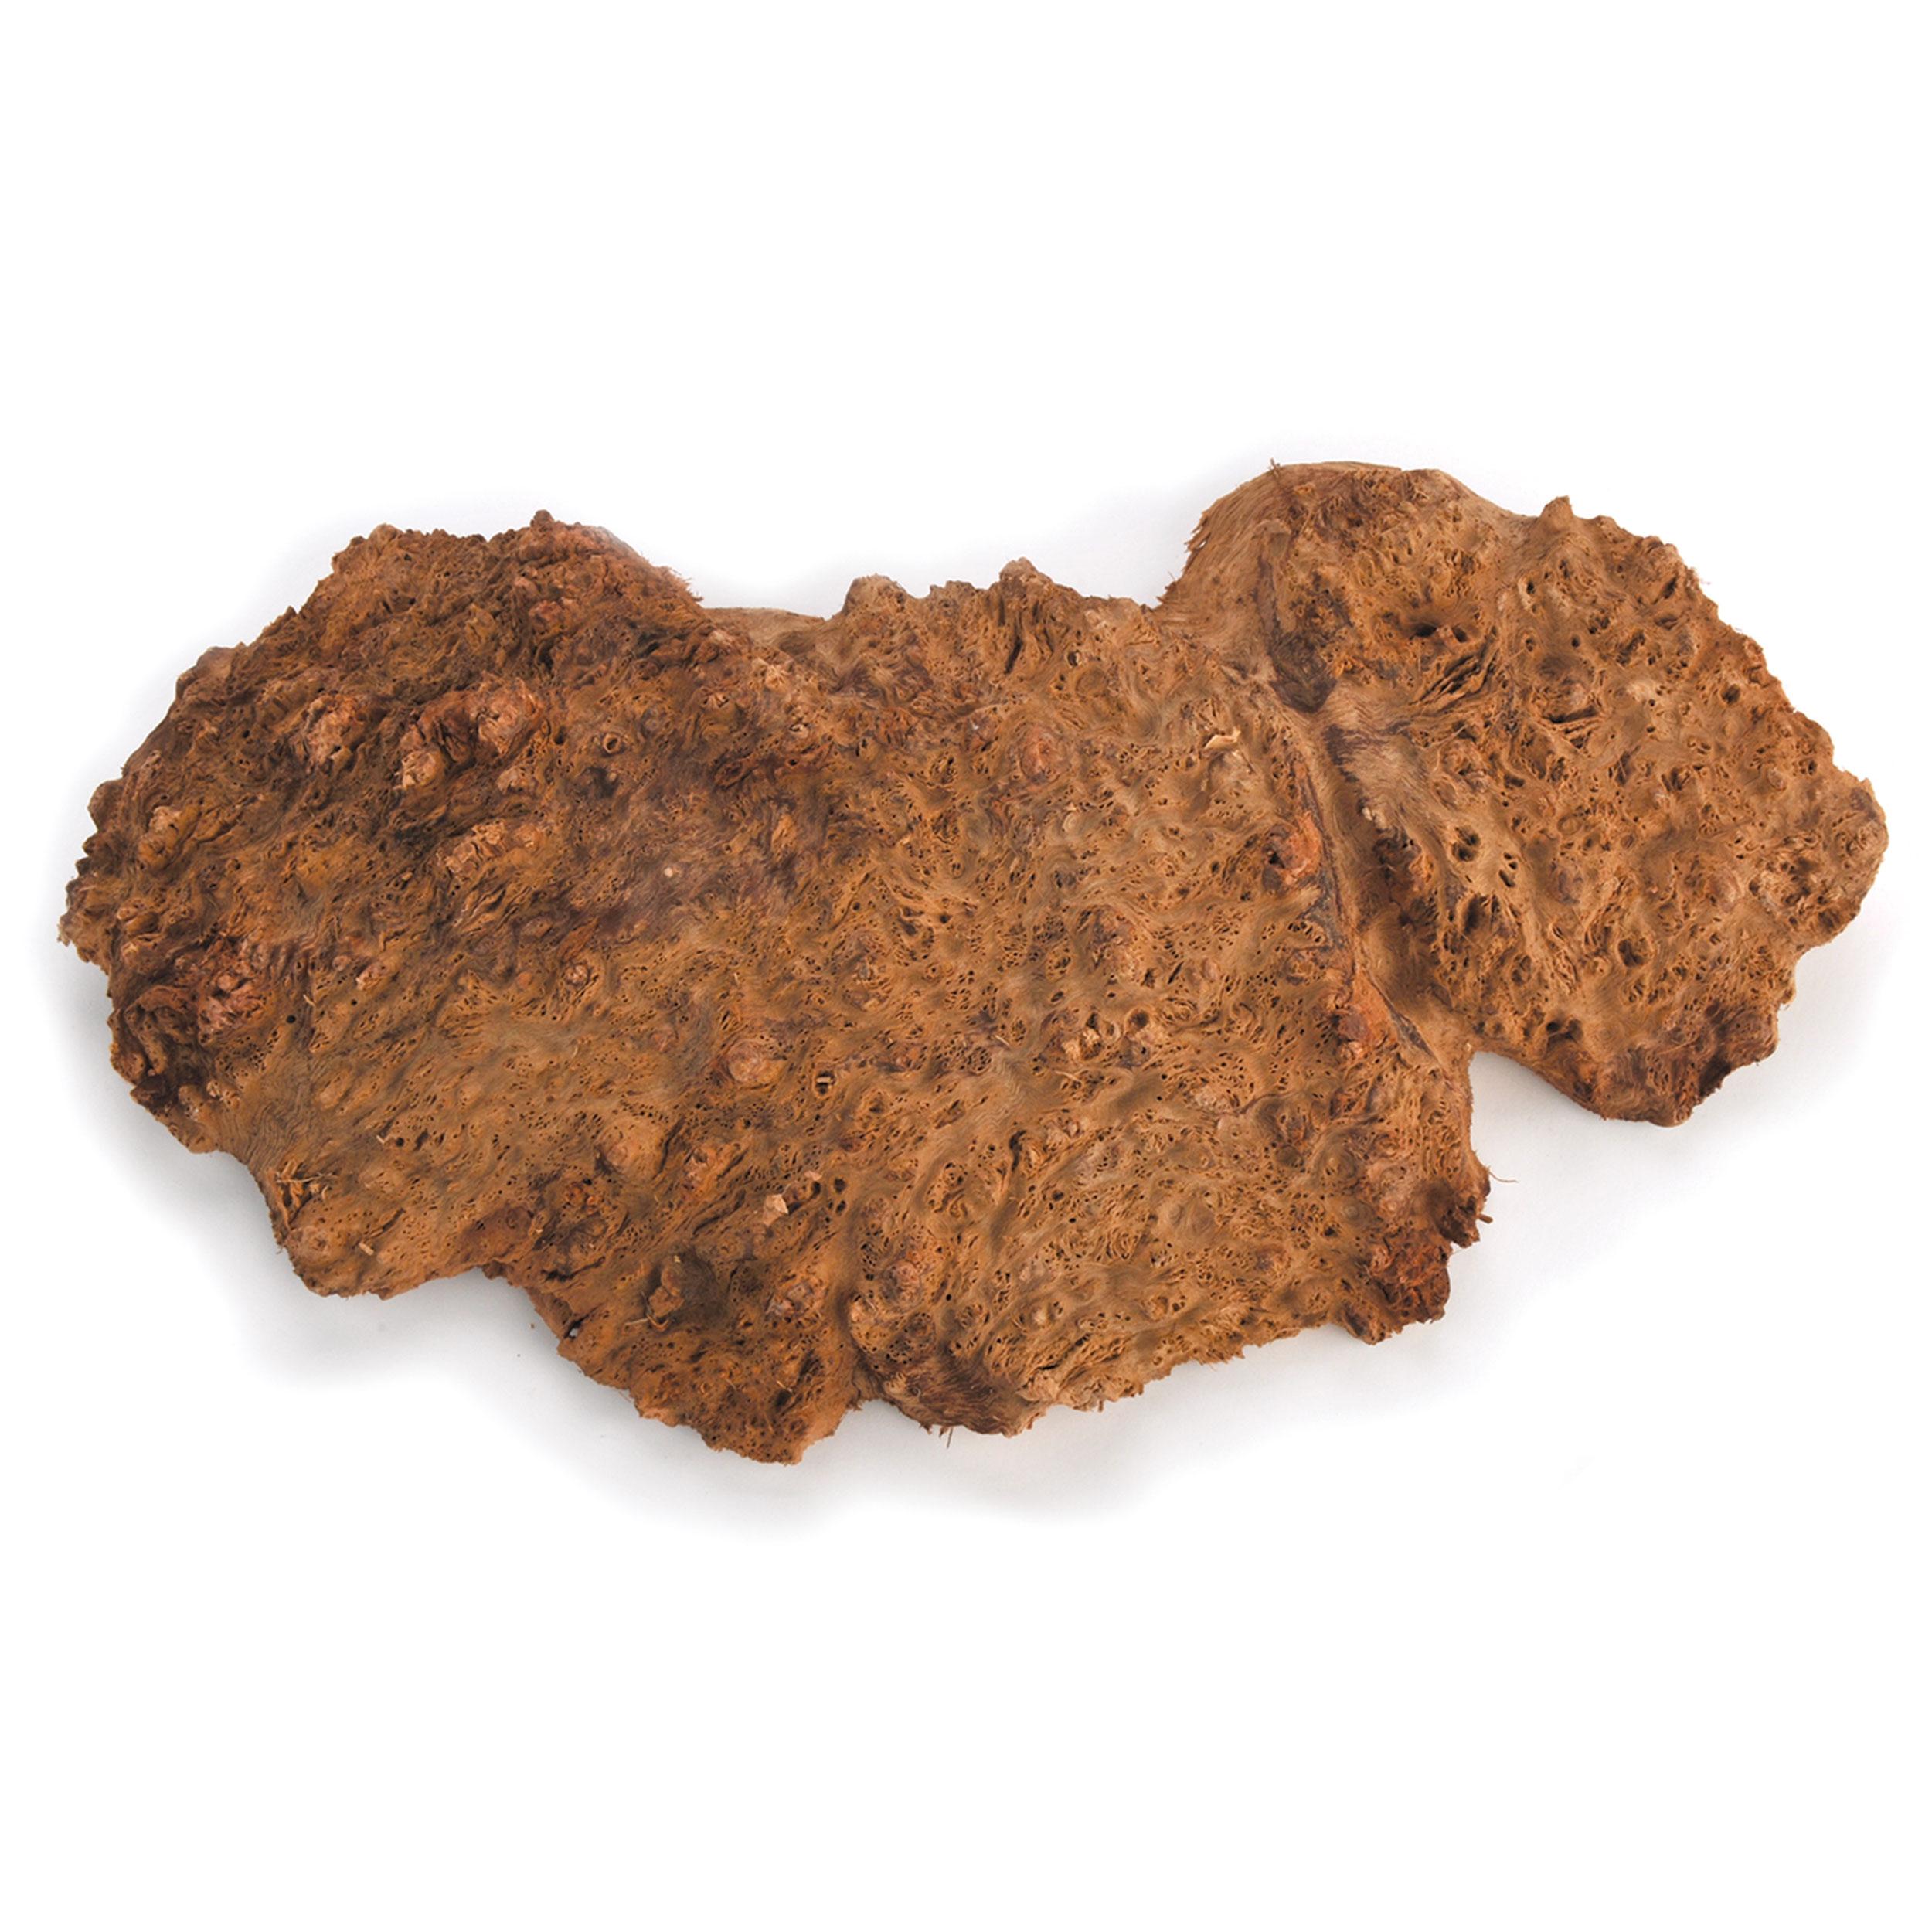 Australian Red Coolibah Burl Cap 1kg ? 2kg